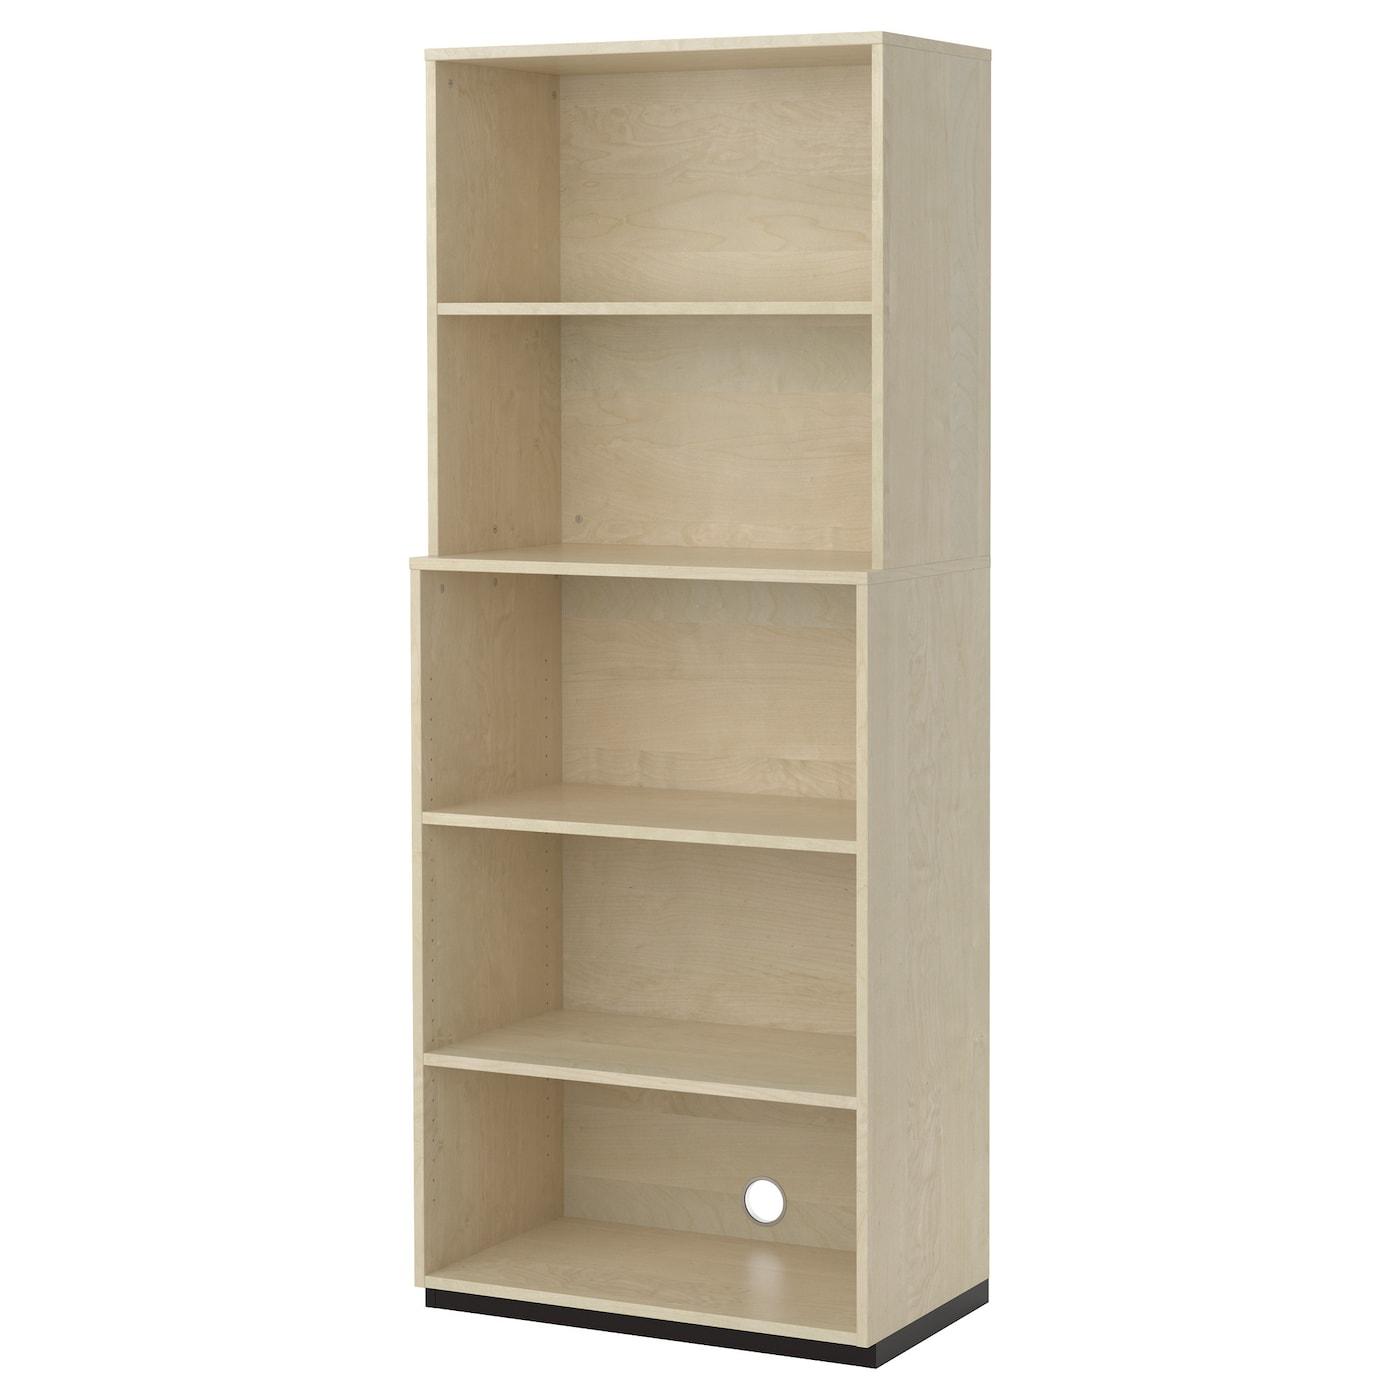 galant open storage combination birch veneer 80x200 cm ikea. Black Bedroom Furniture Sets. Home Design Ideas